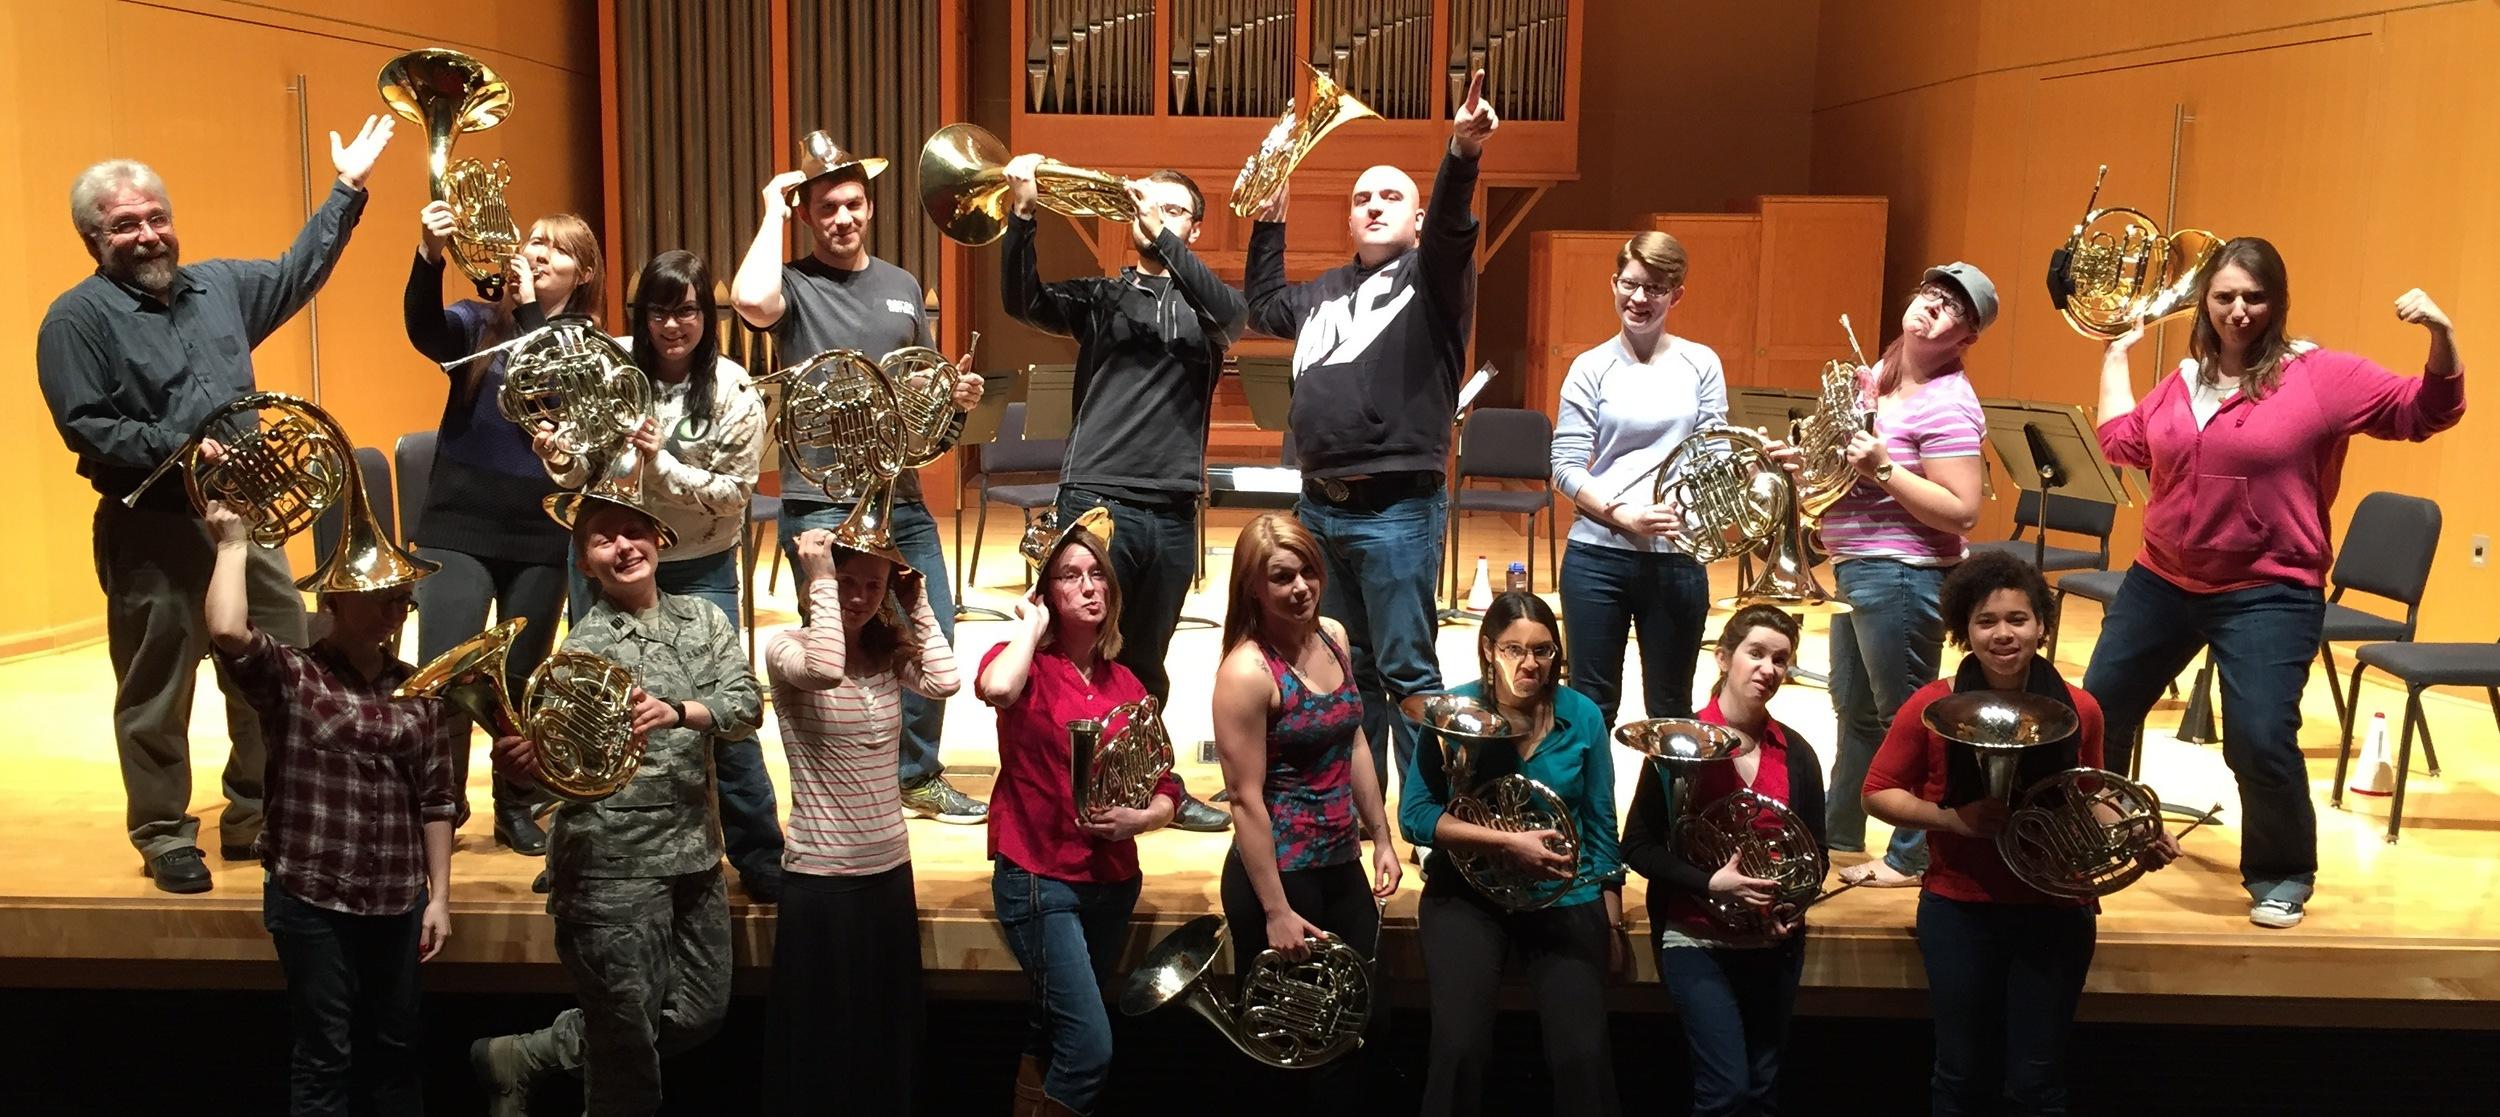 Central Washington University Horn Ensemble